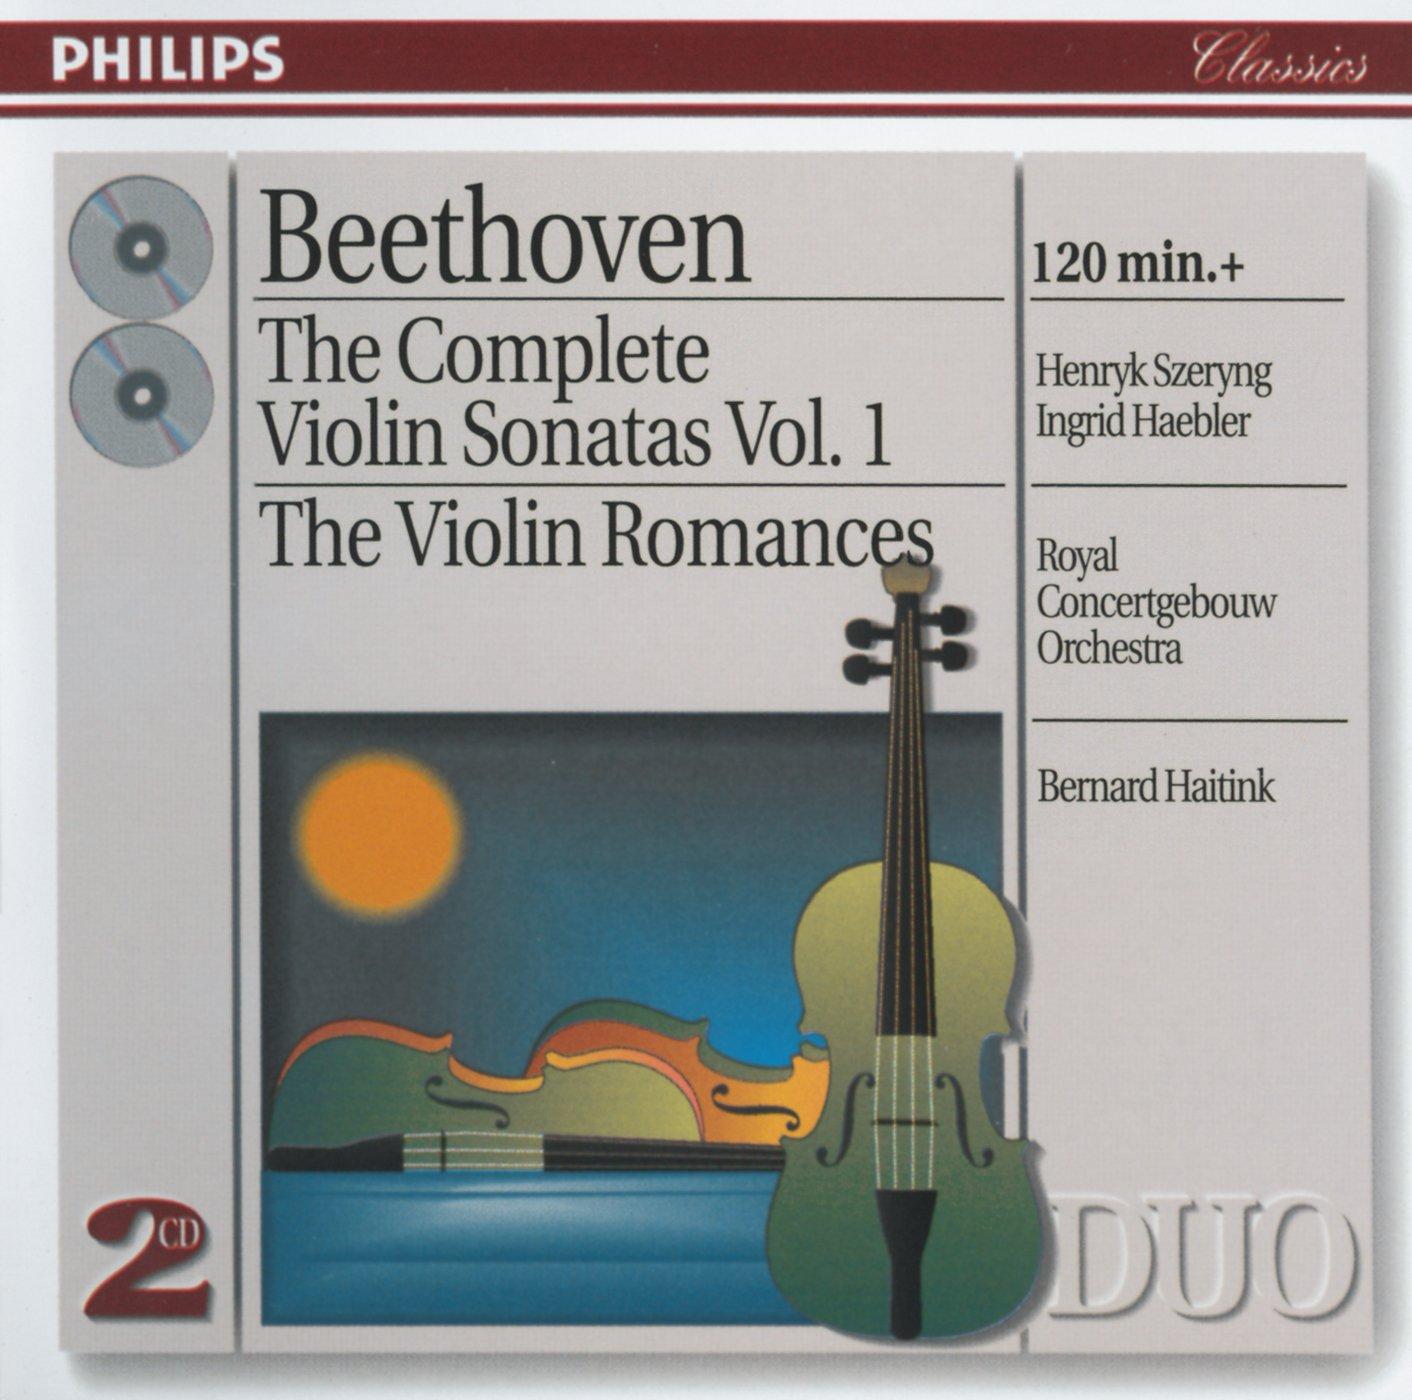 Bernard Haitink - Beethoven: The Complete Violin Sonatas, Vol. 1 ...